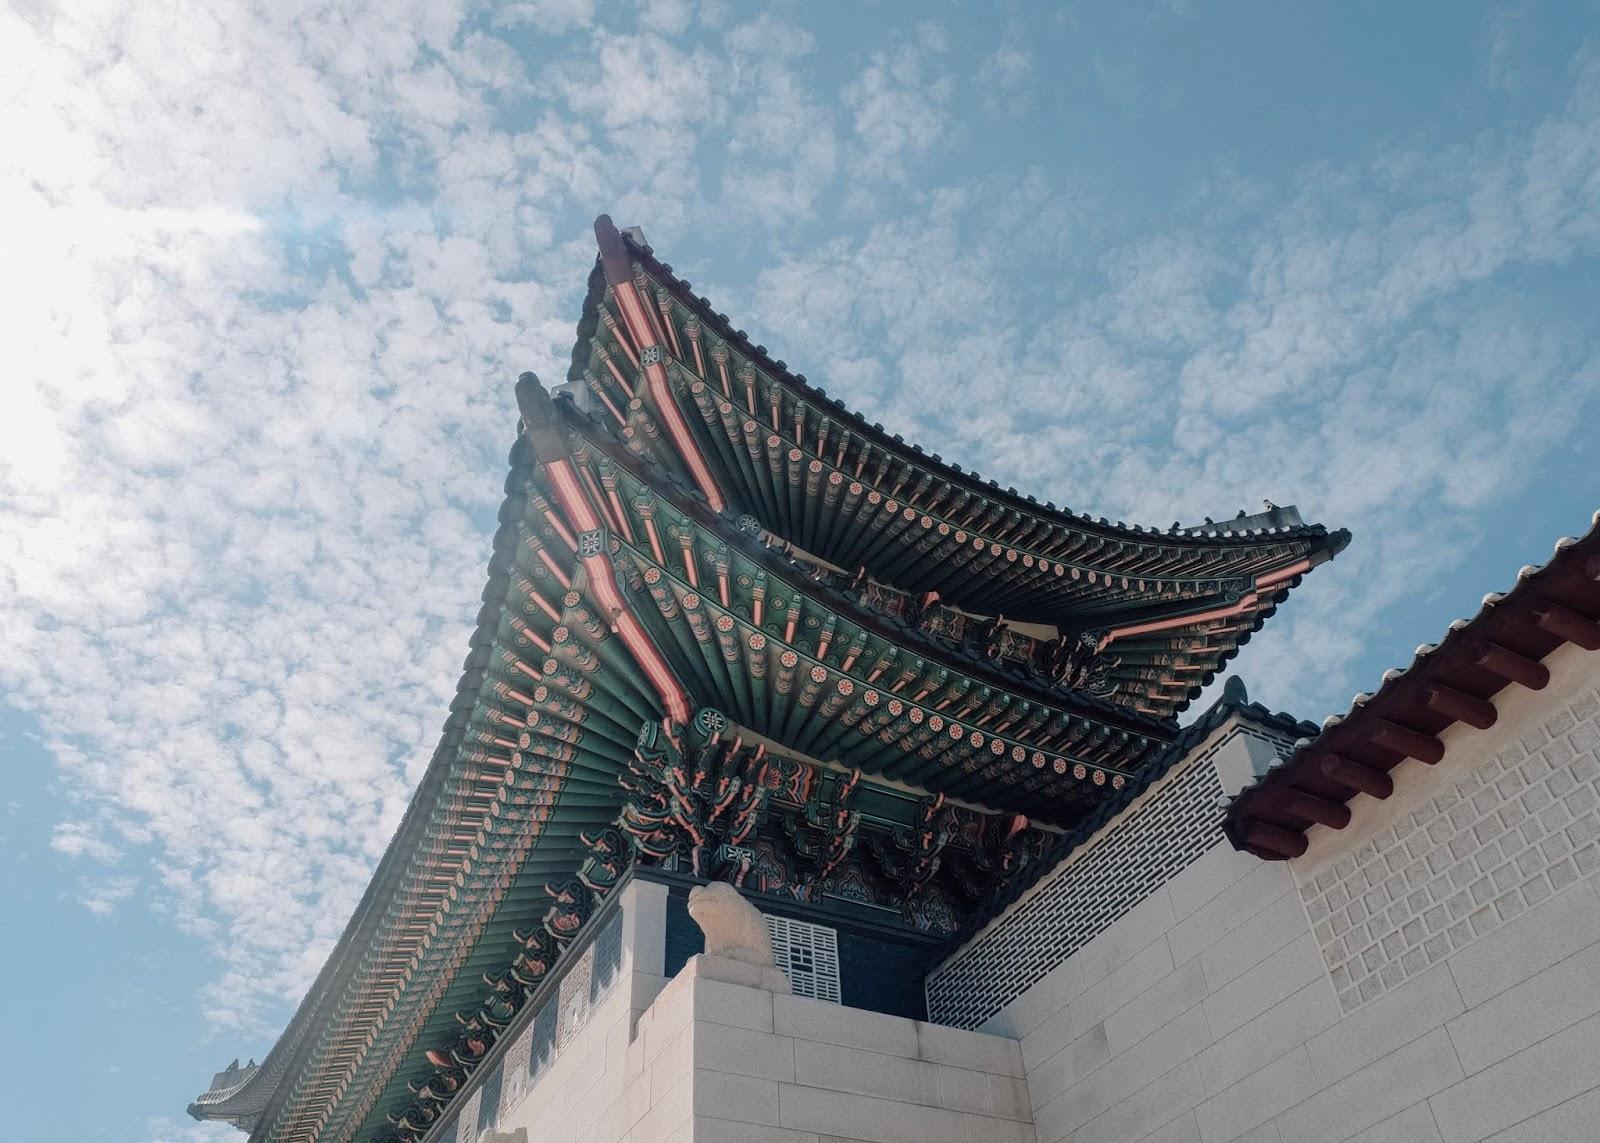 Gyeongbokgung Palace Seoul Korea Curitan Aqalili